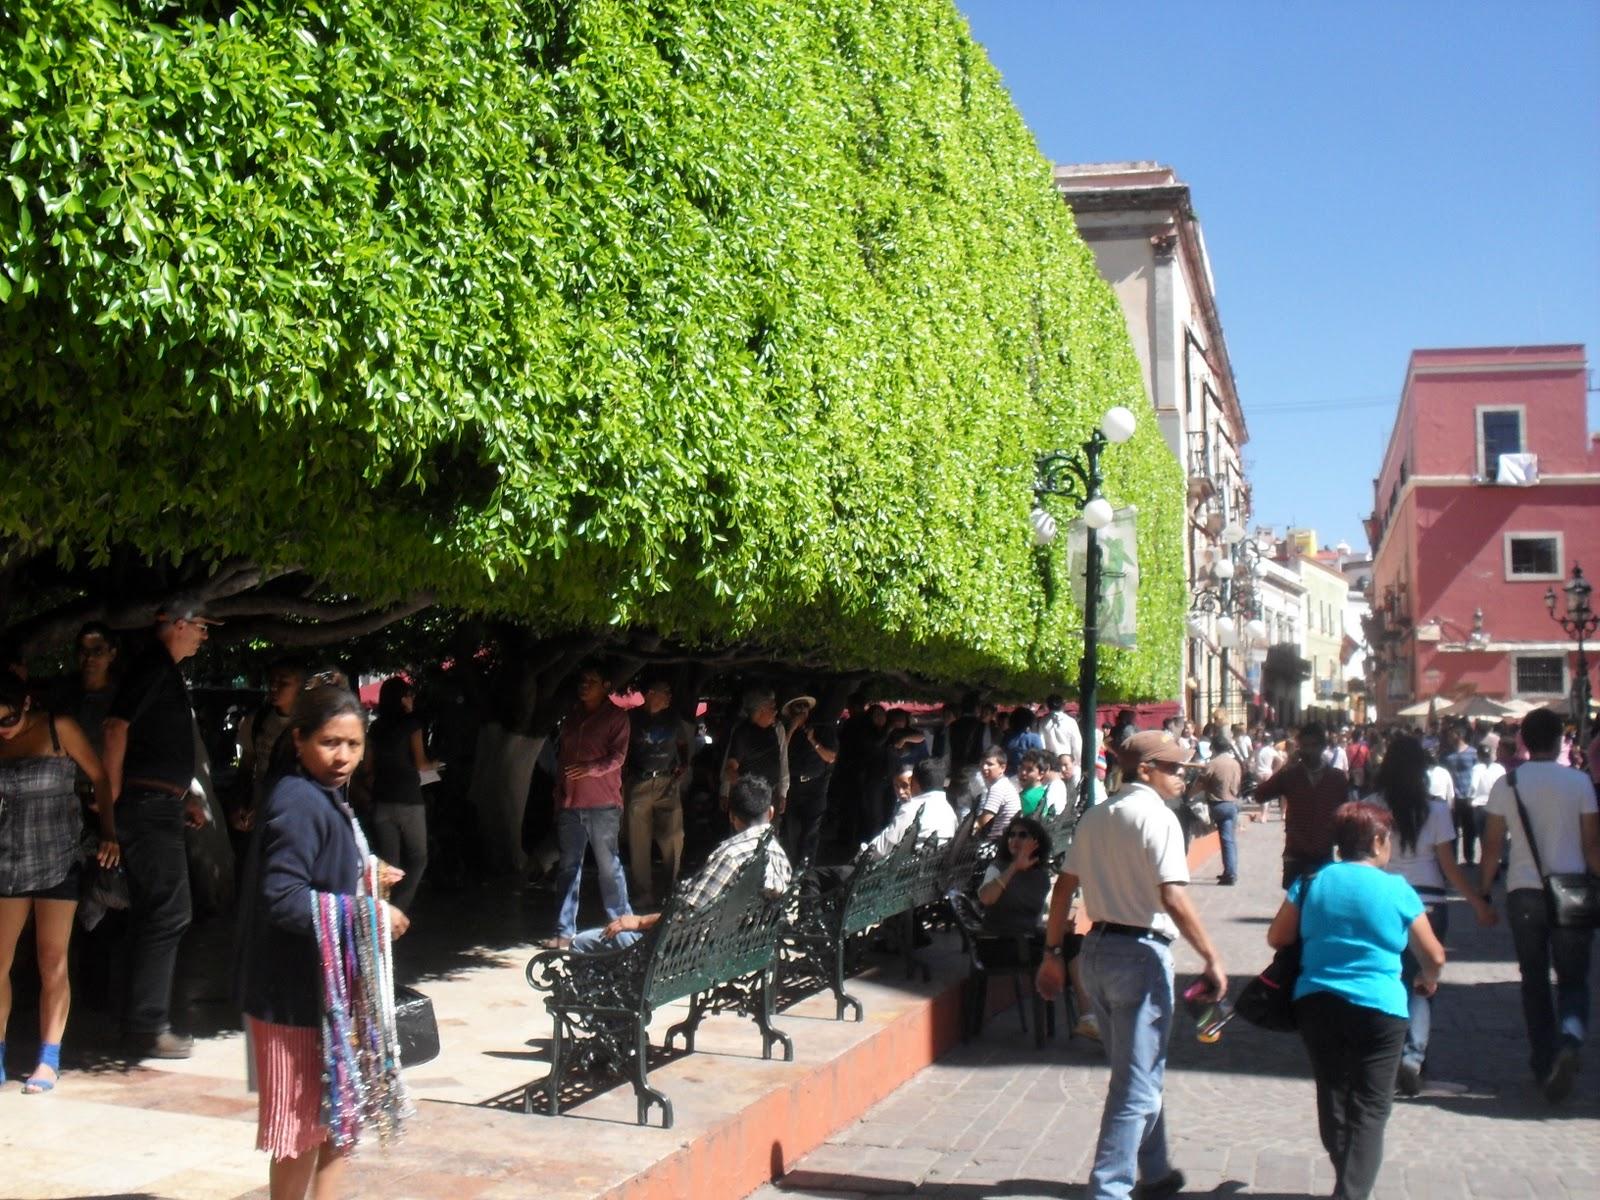 Mi diario urbano festival internacional cervantino en for 7 jardines guanajuato